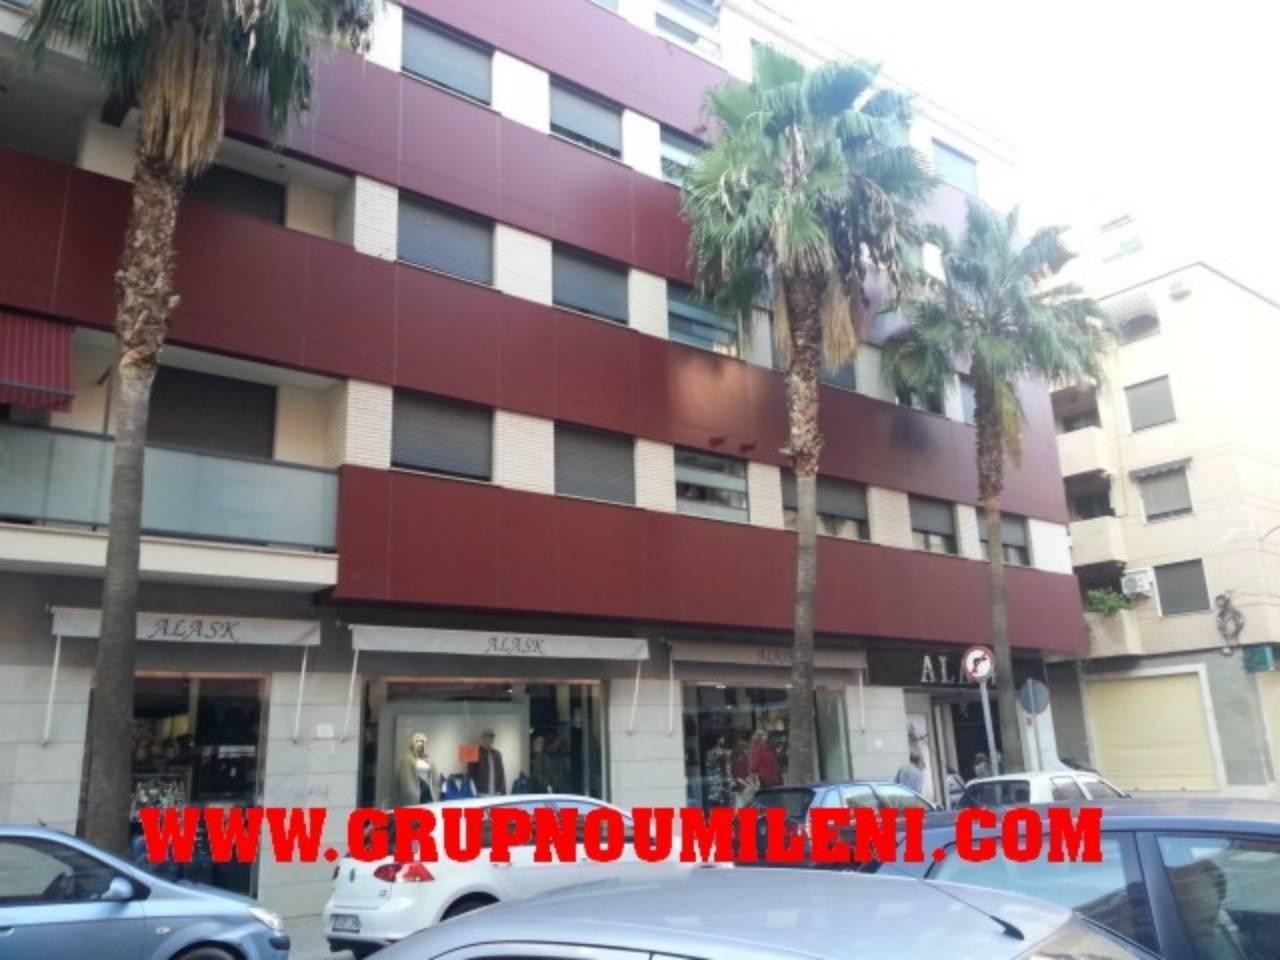 Lloguer Aparcament cotxe  Filiberto rodrigo. Superf. 10 m², 1 plazas, subterráneo, columnas laterales.